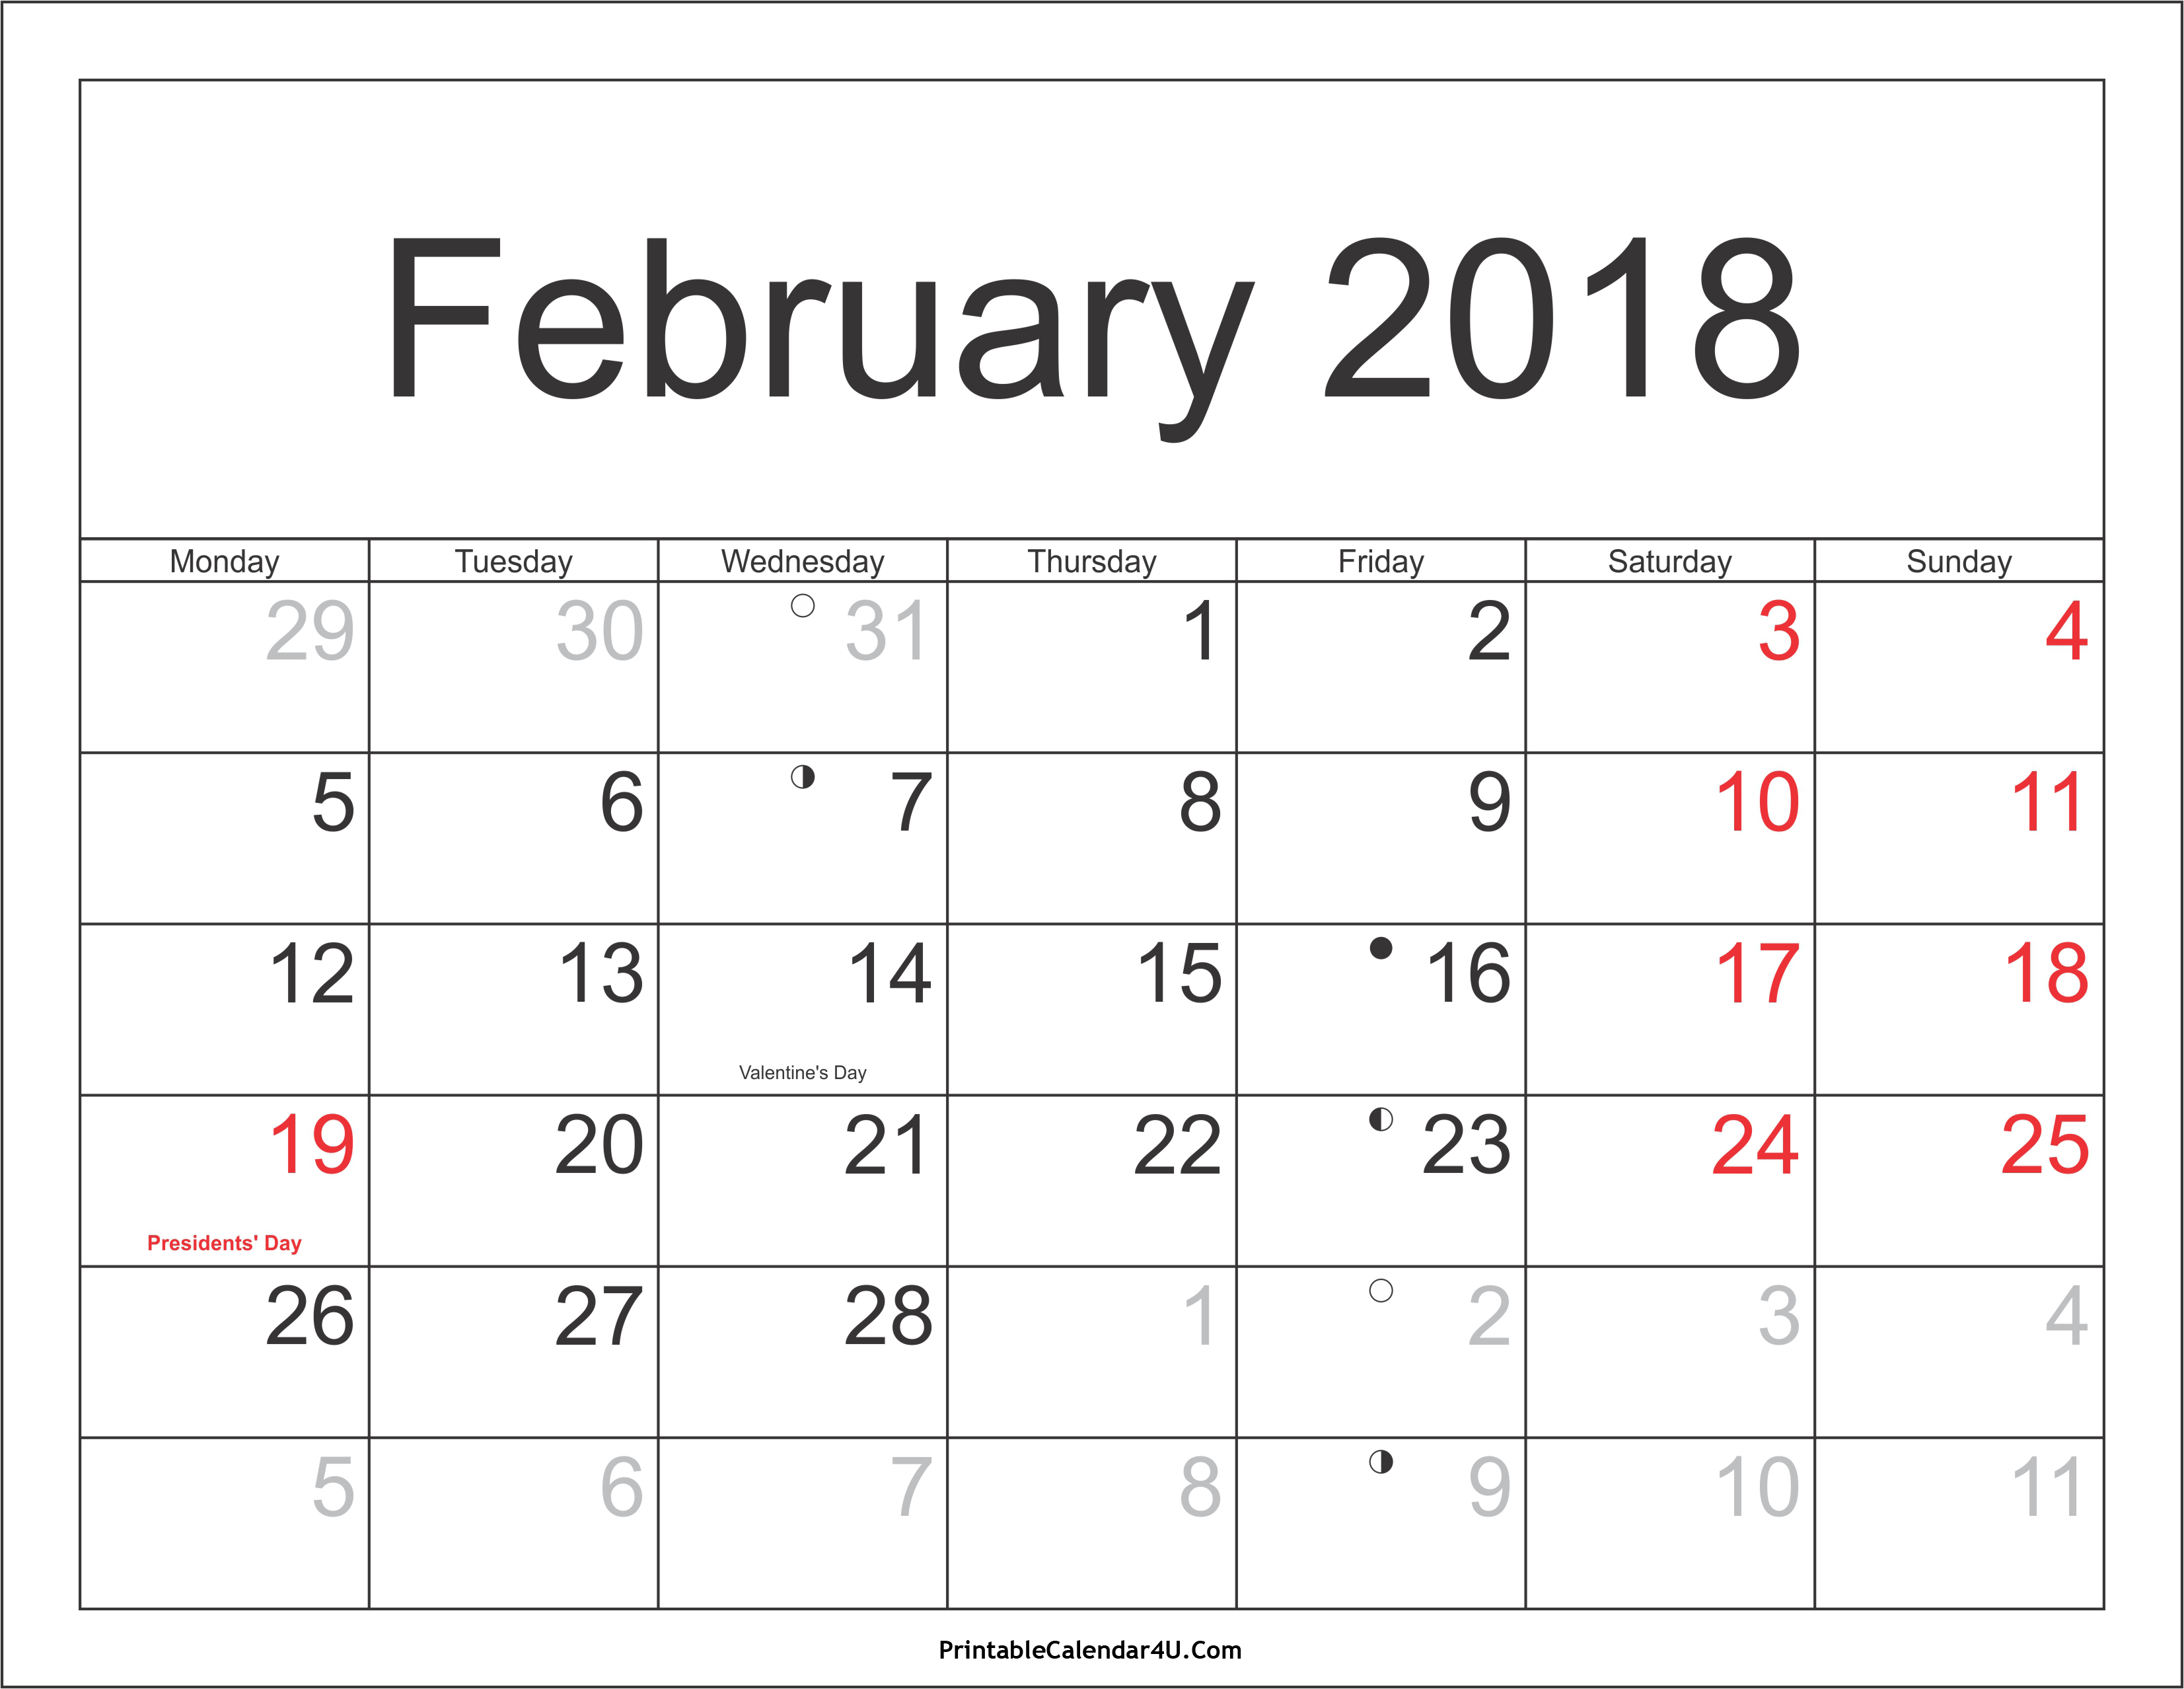 February 2018 Calendar Template